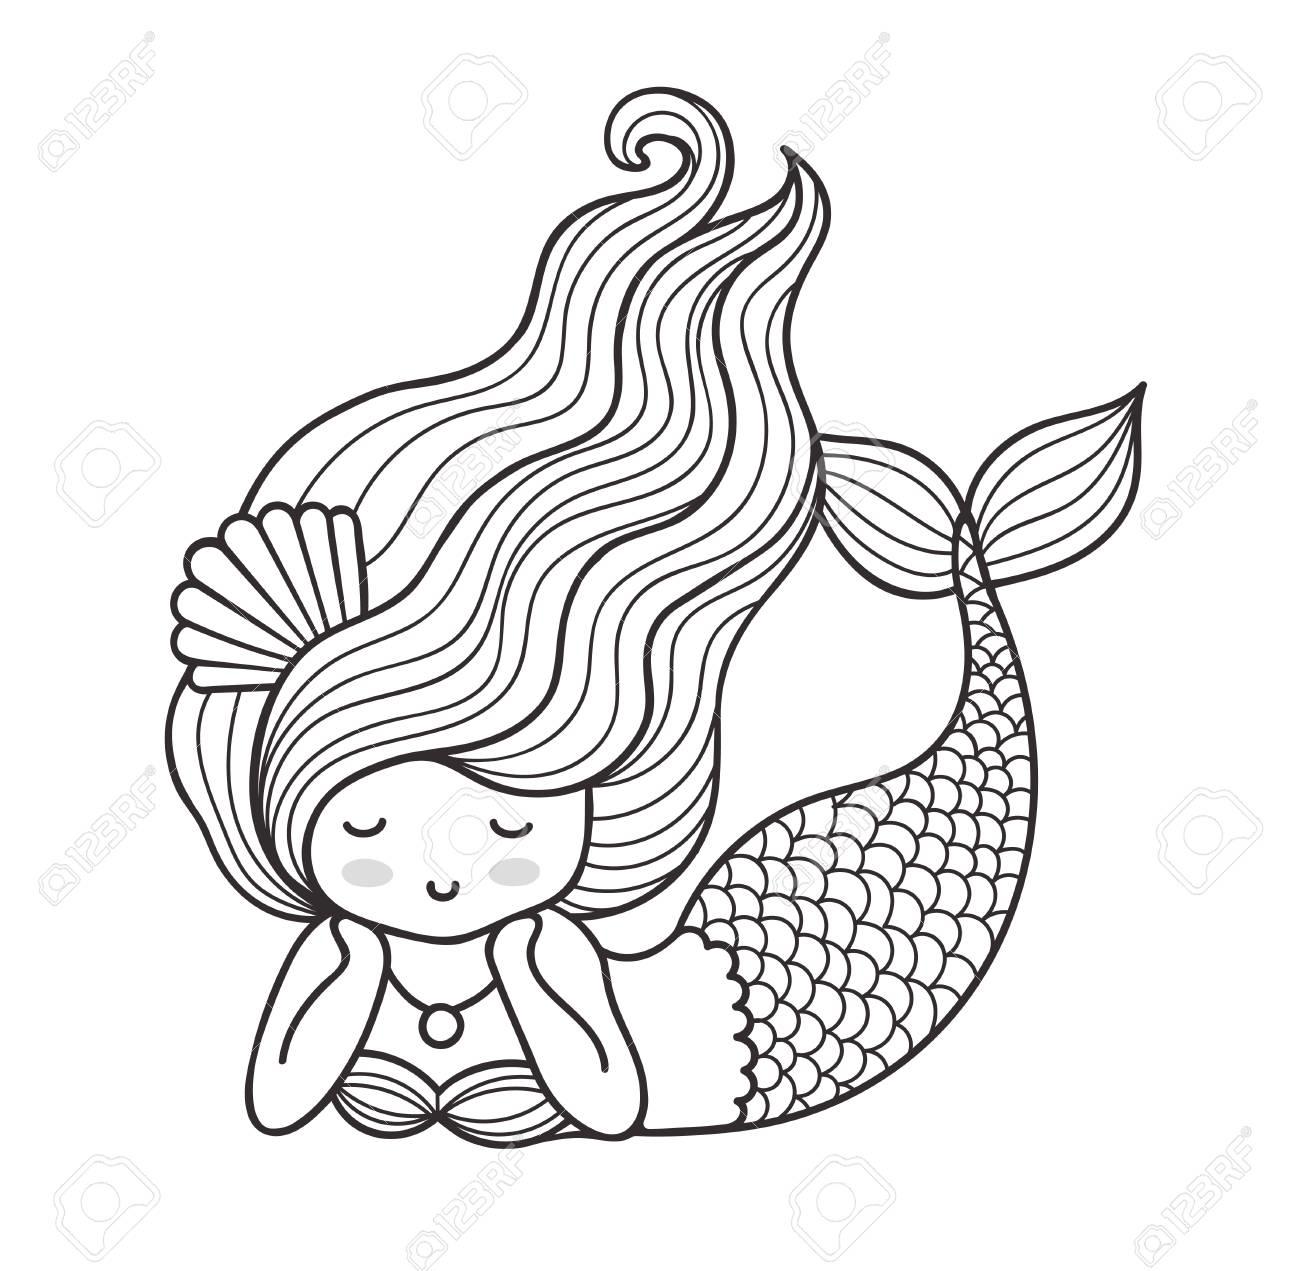 dreamy lying mermaid with